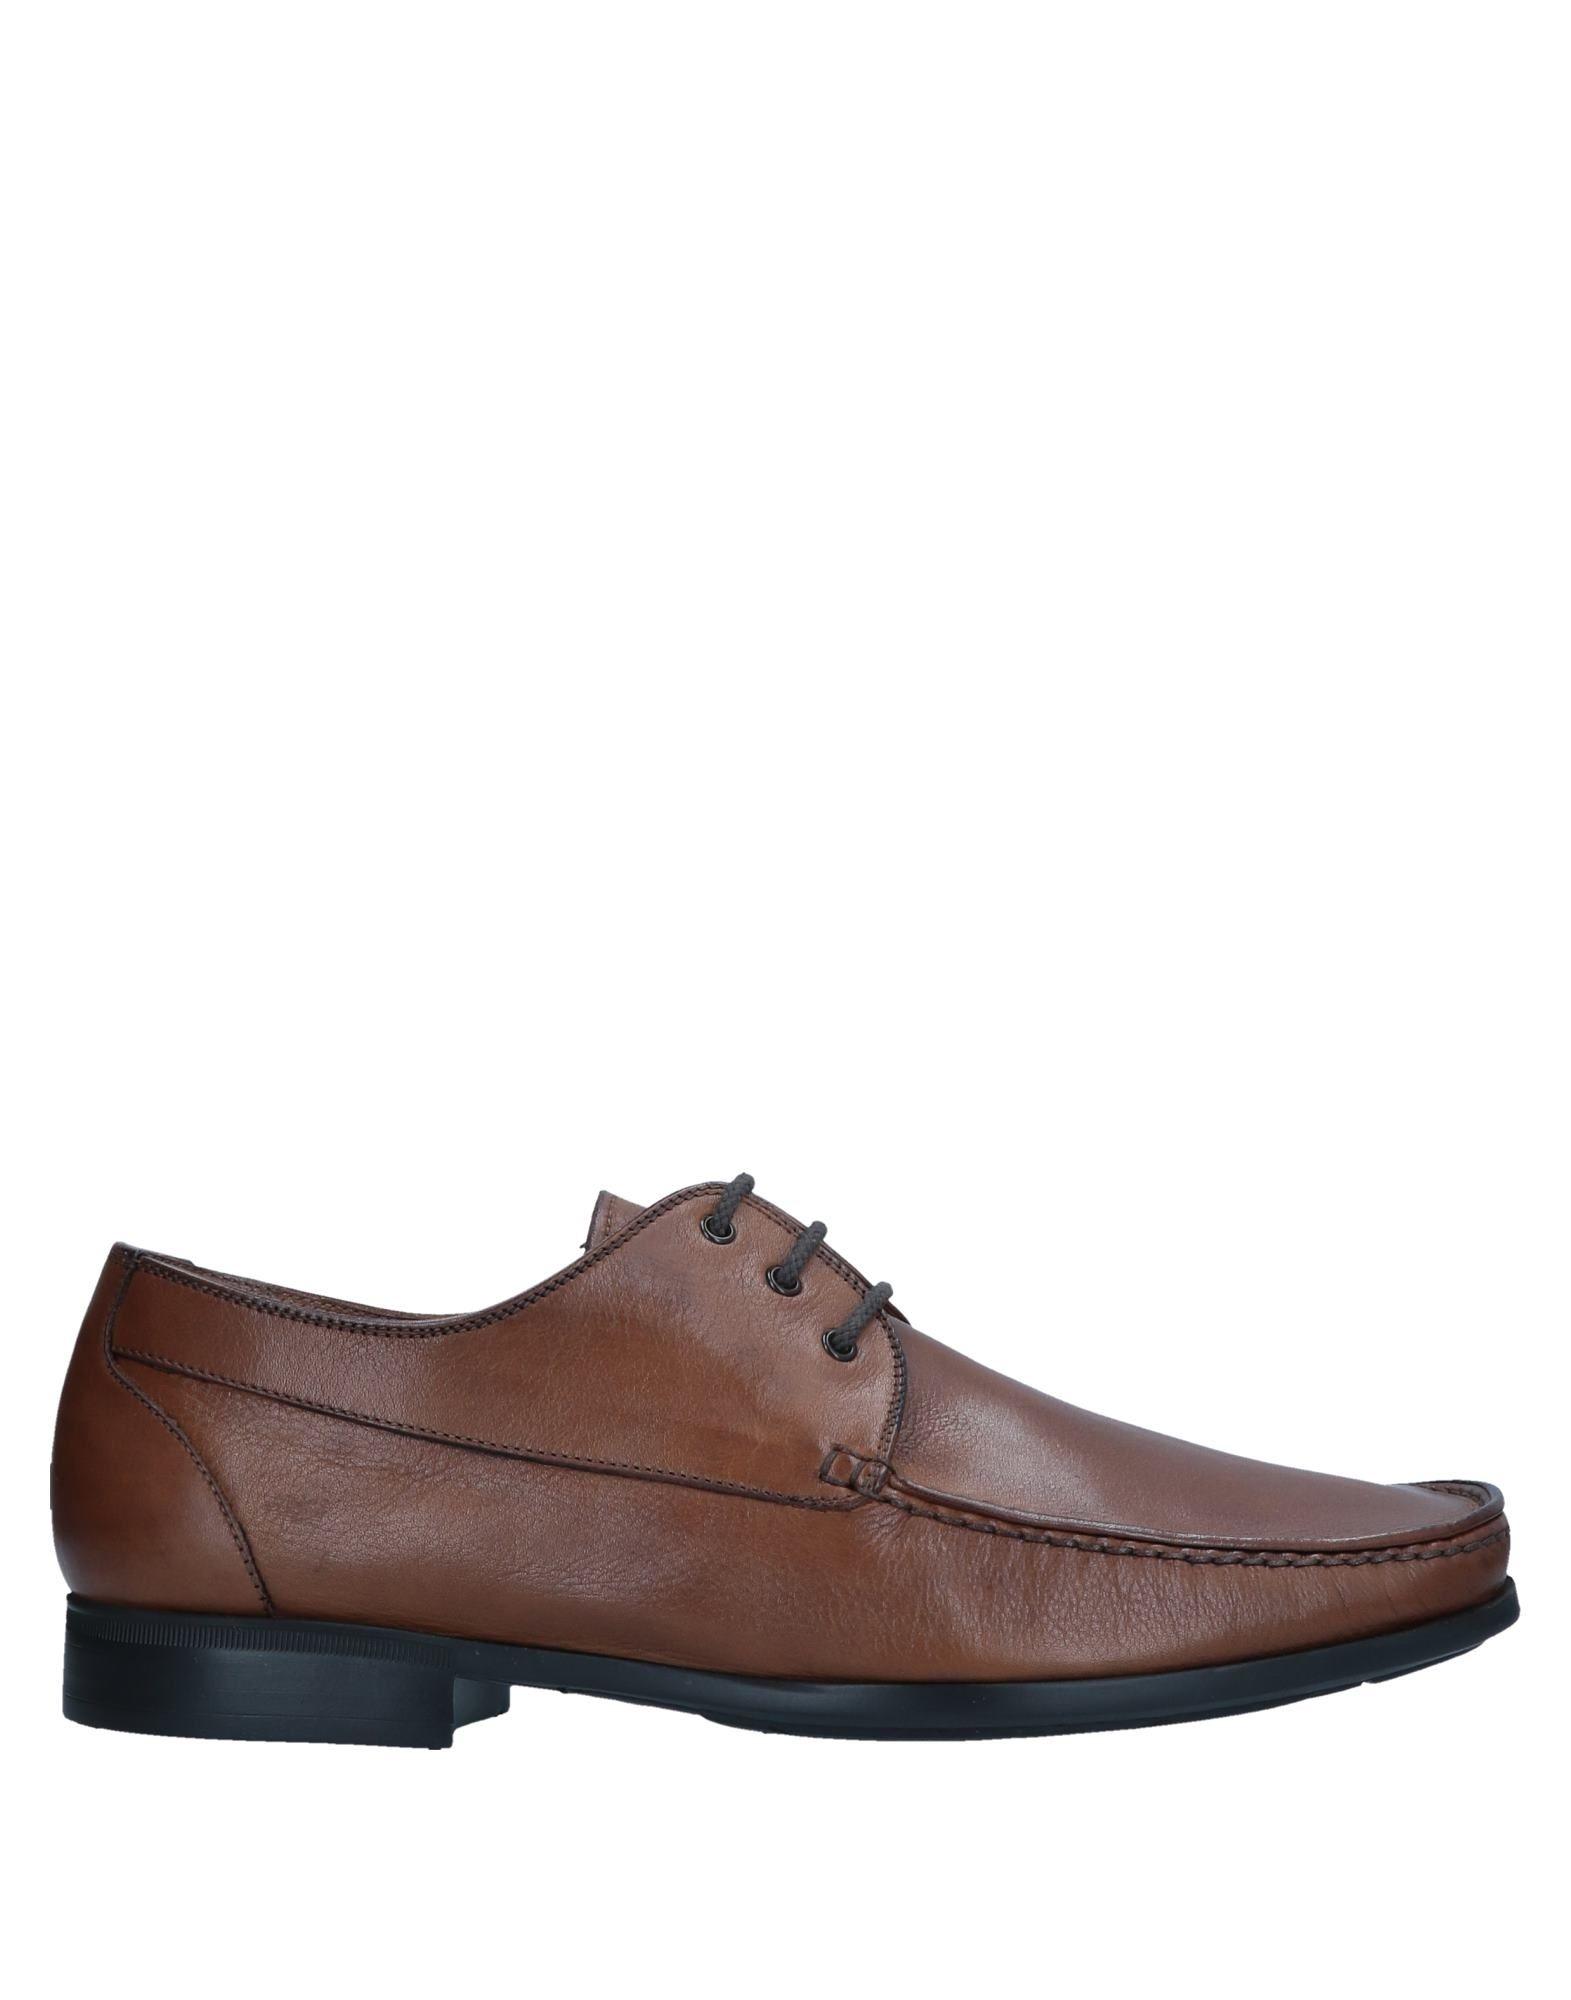 Rabatt echte Schuhe Herren Today By Calpierre Schnürschuhe Herren Schuhe  11551615AQ ba0a4d